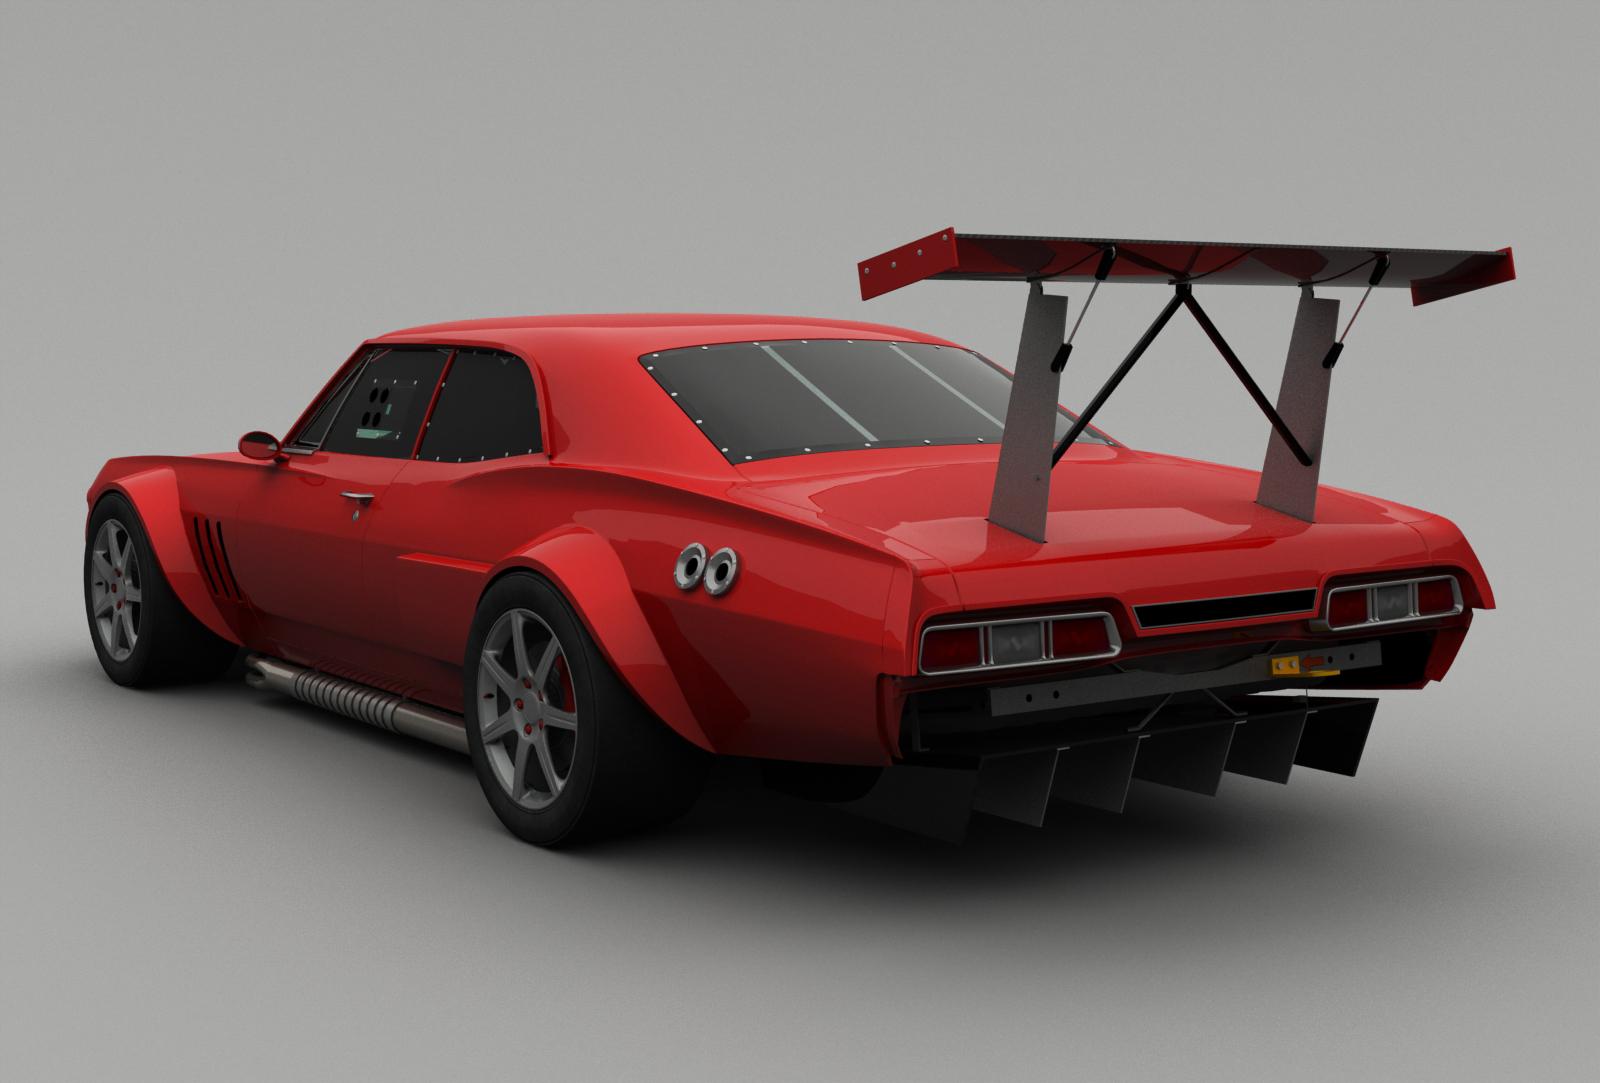 2013-03_The Crew_F.Beudin_Chevrolet Impala-1967-Racing_07